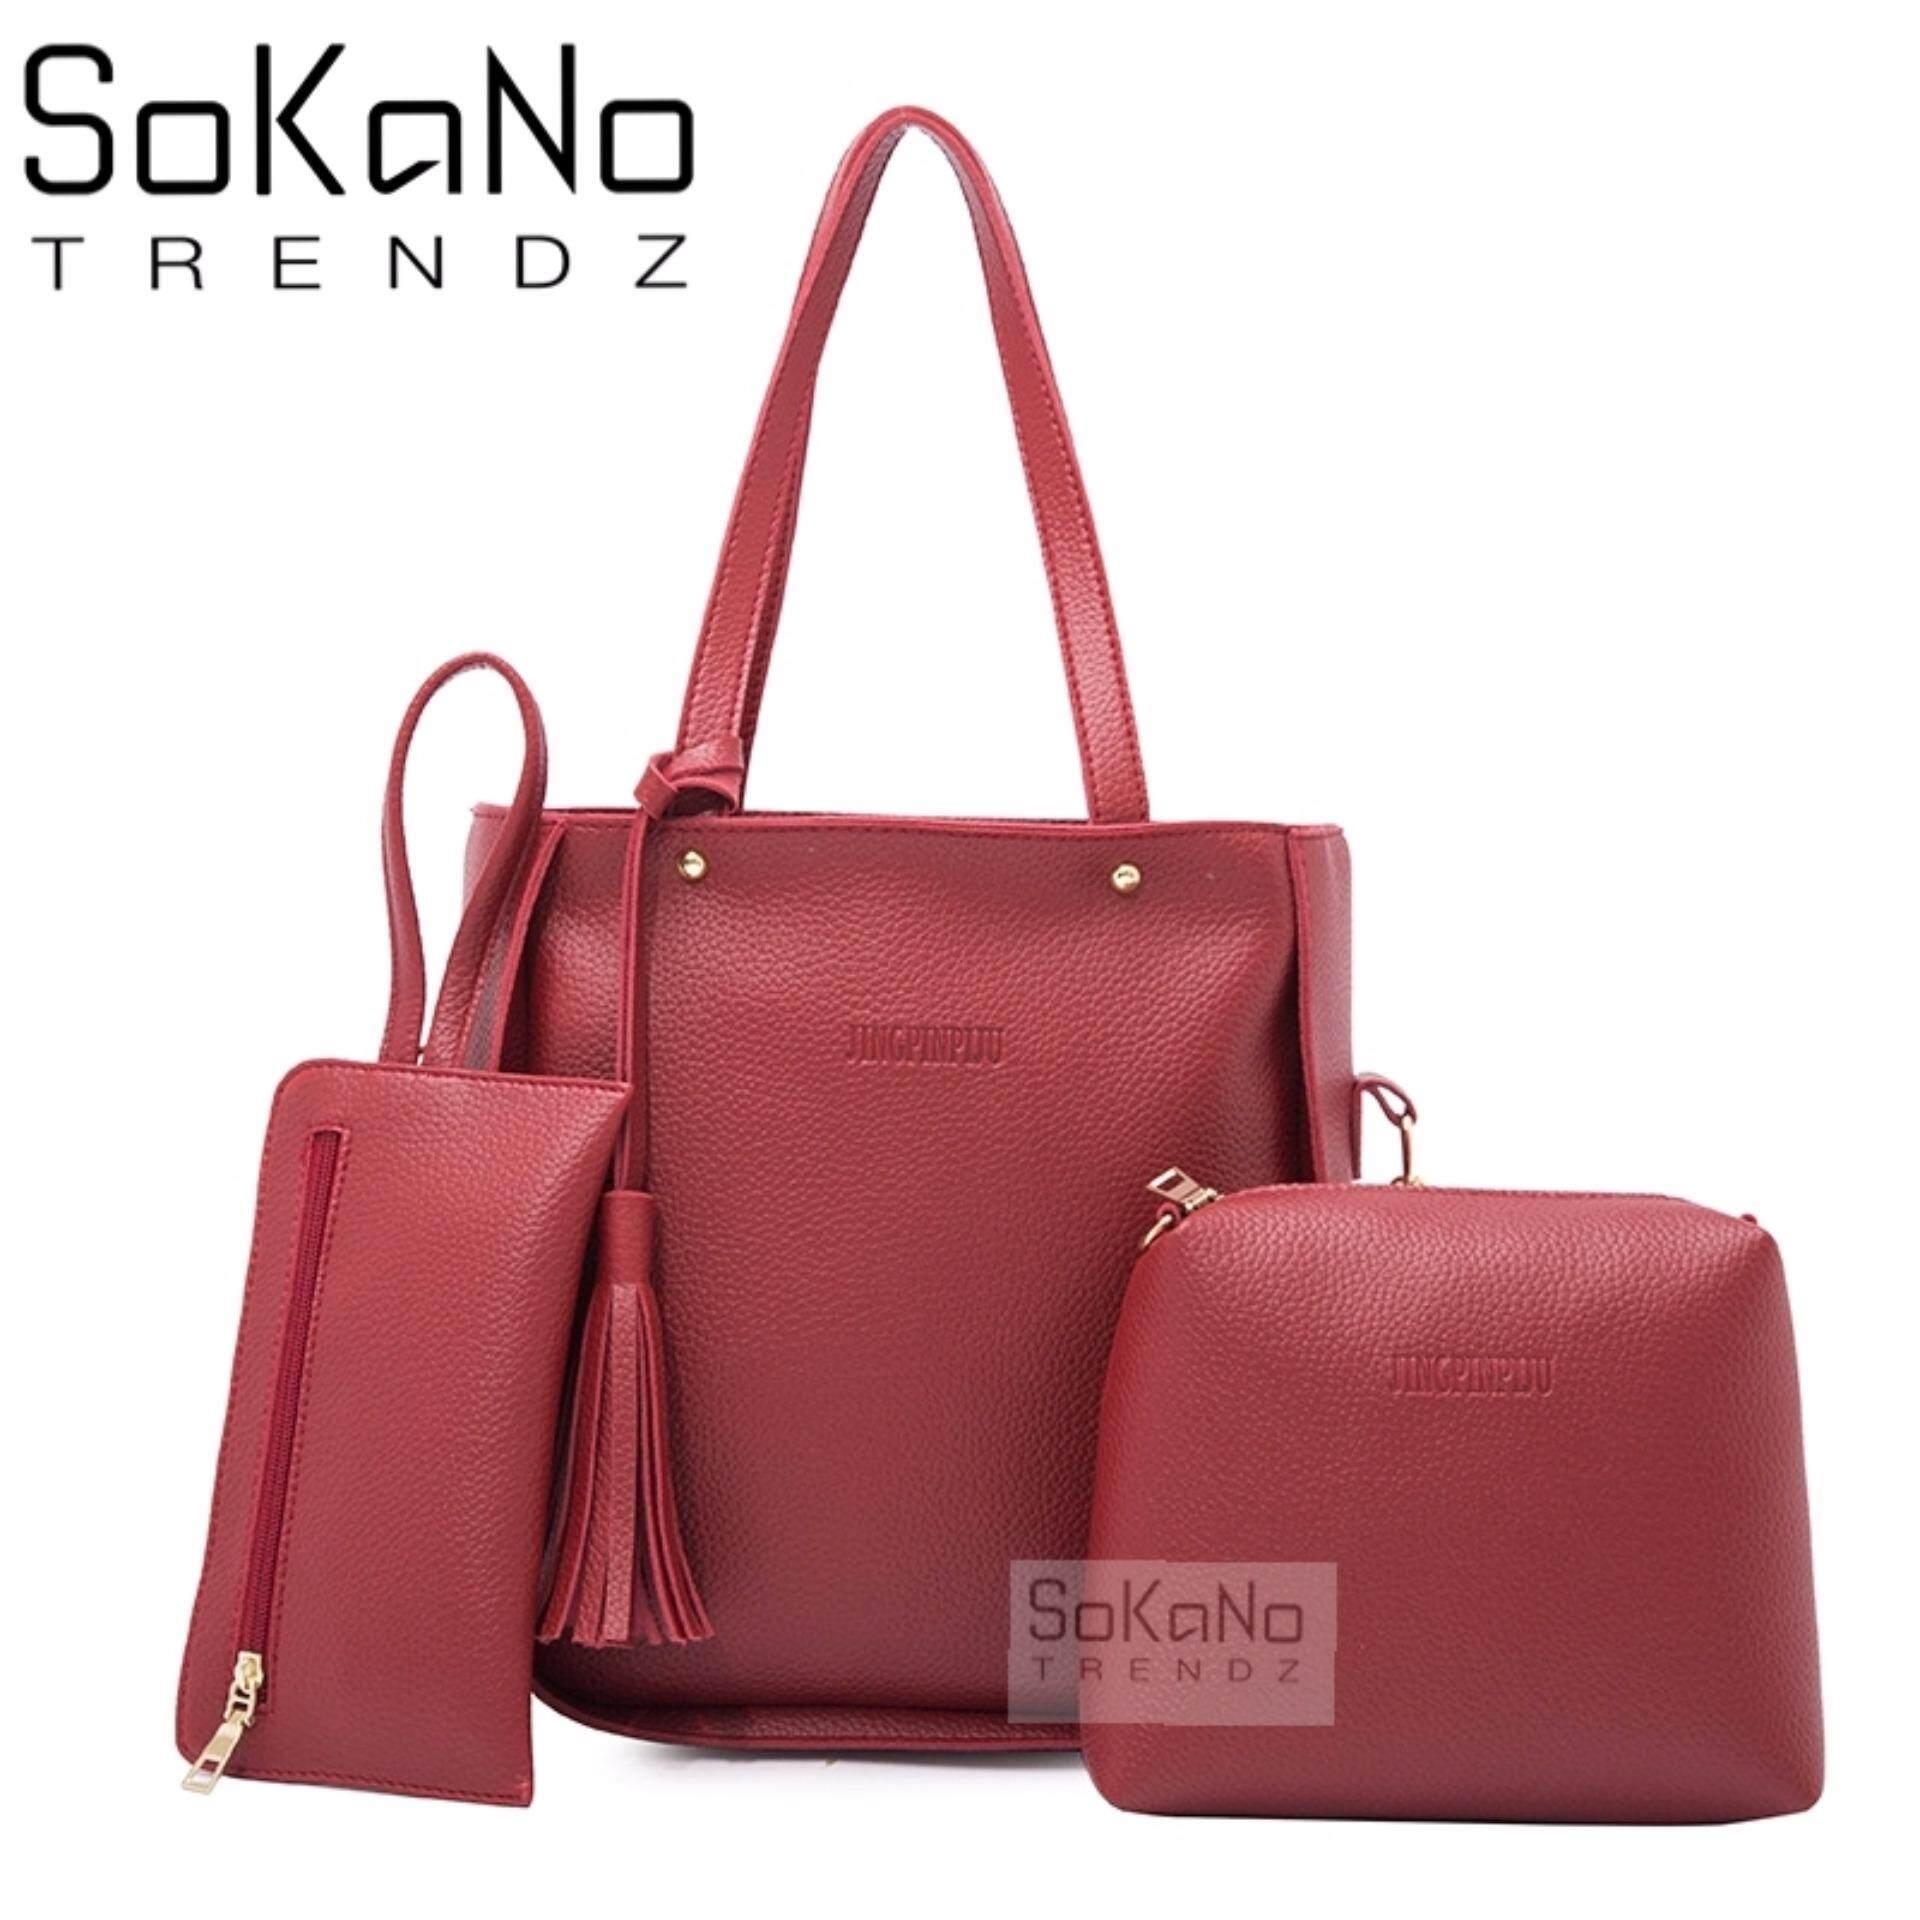 SoKaNo Trendz SKN825 PU Leather Tote Bag Set of 3 Handbeg Wanita- Red